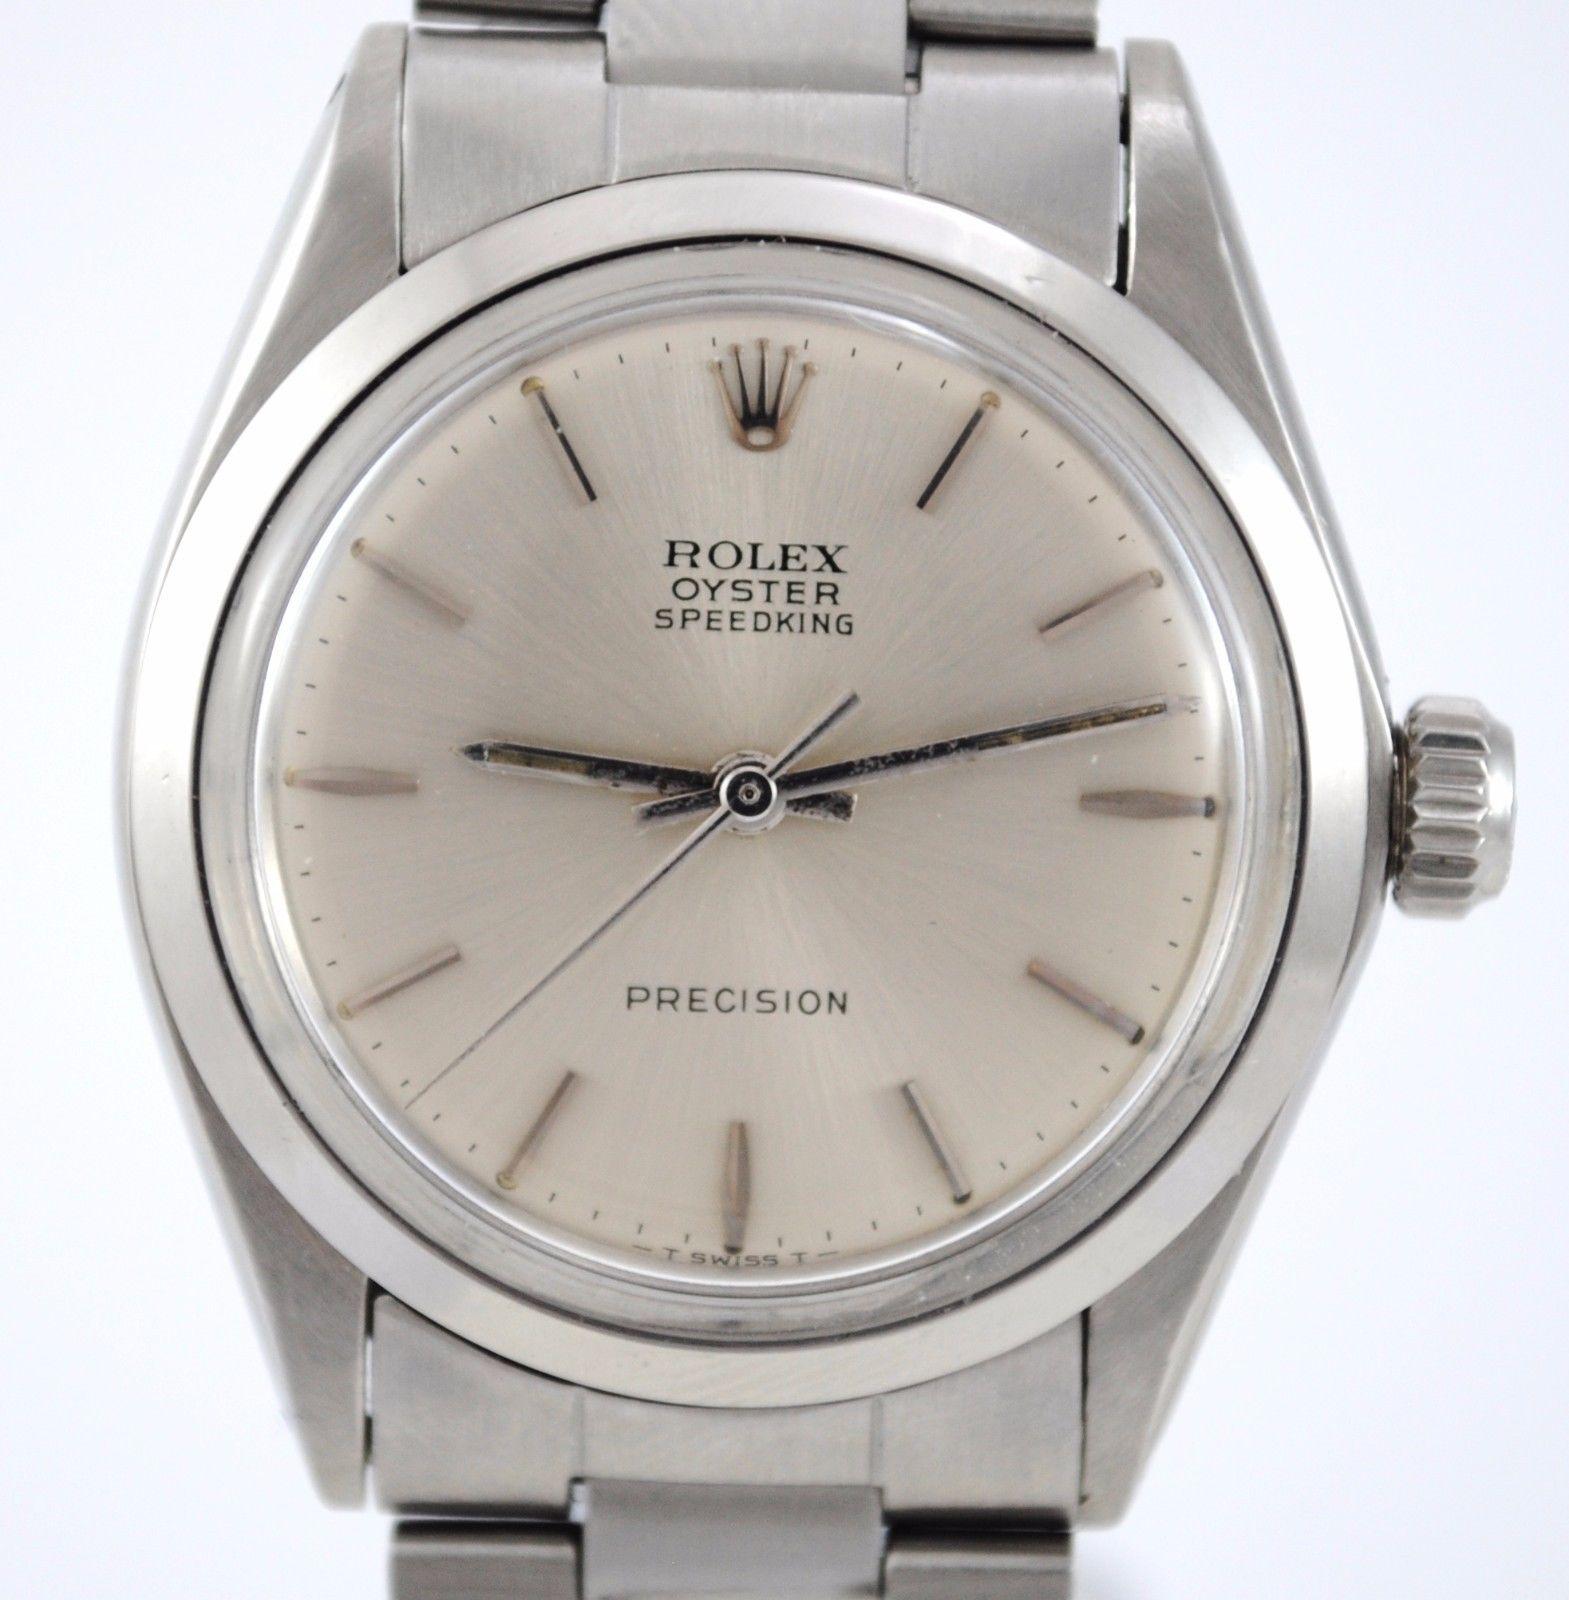 Rolex - 6430 - Speedking - Mens